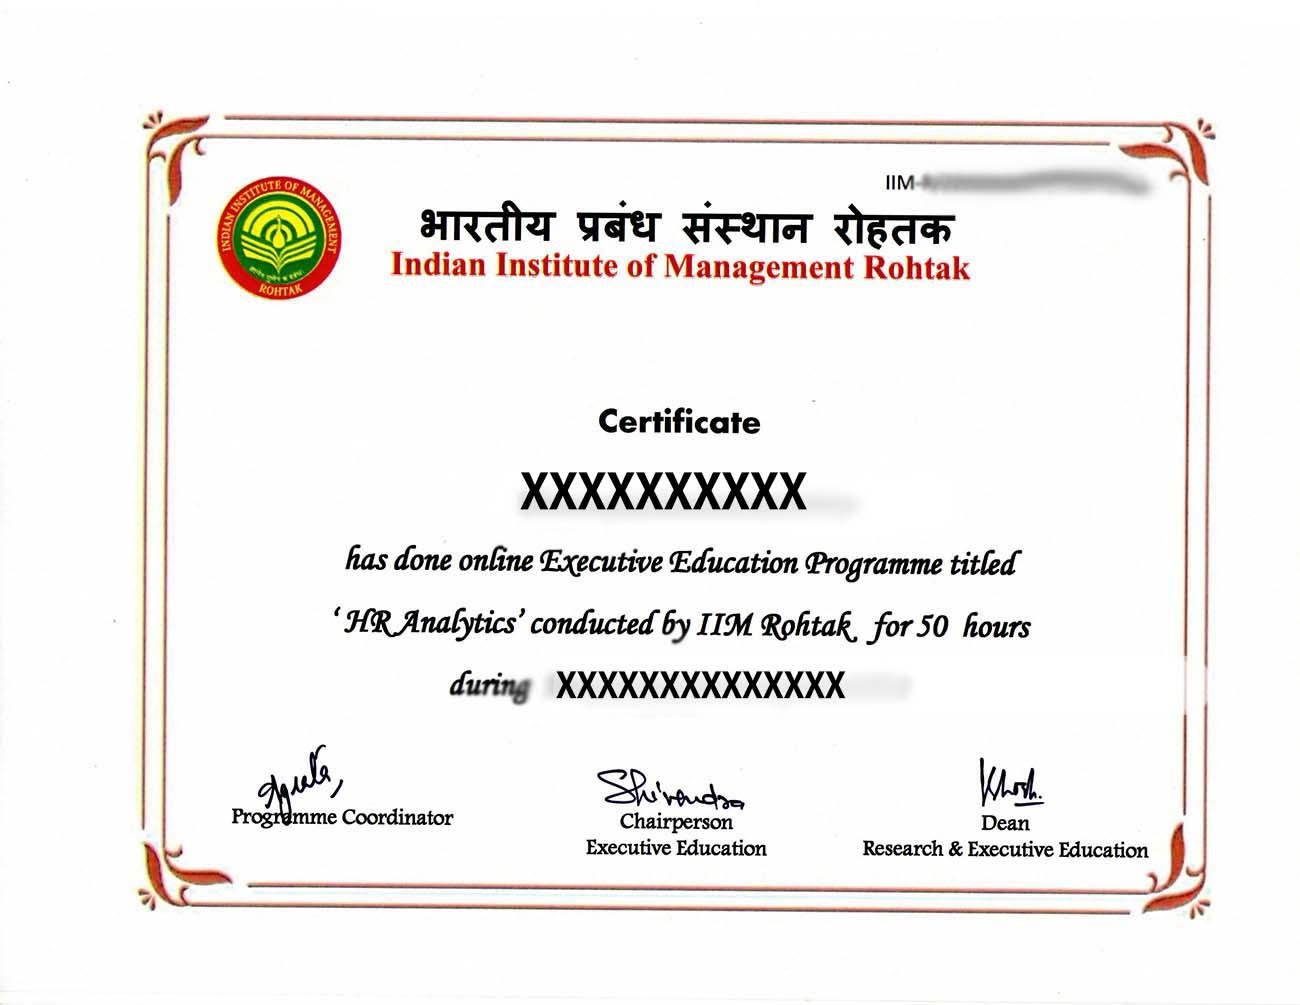 IIM Rohtak Certificate